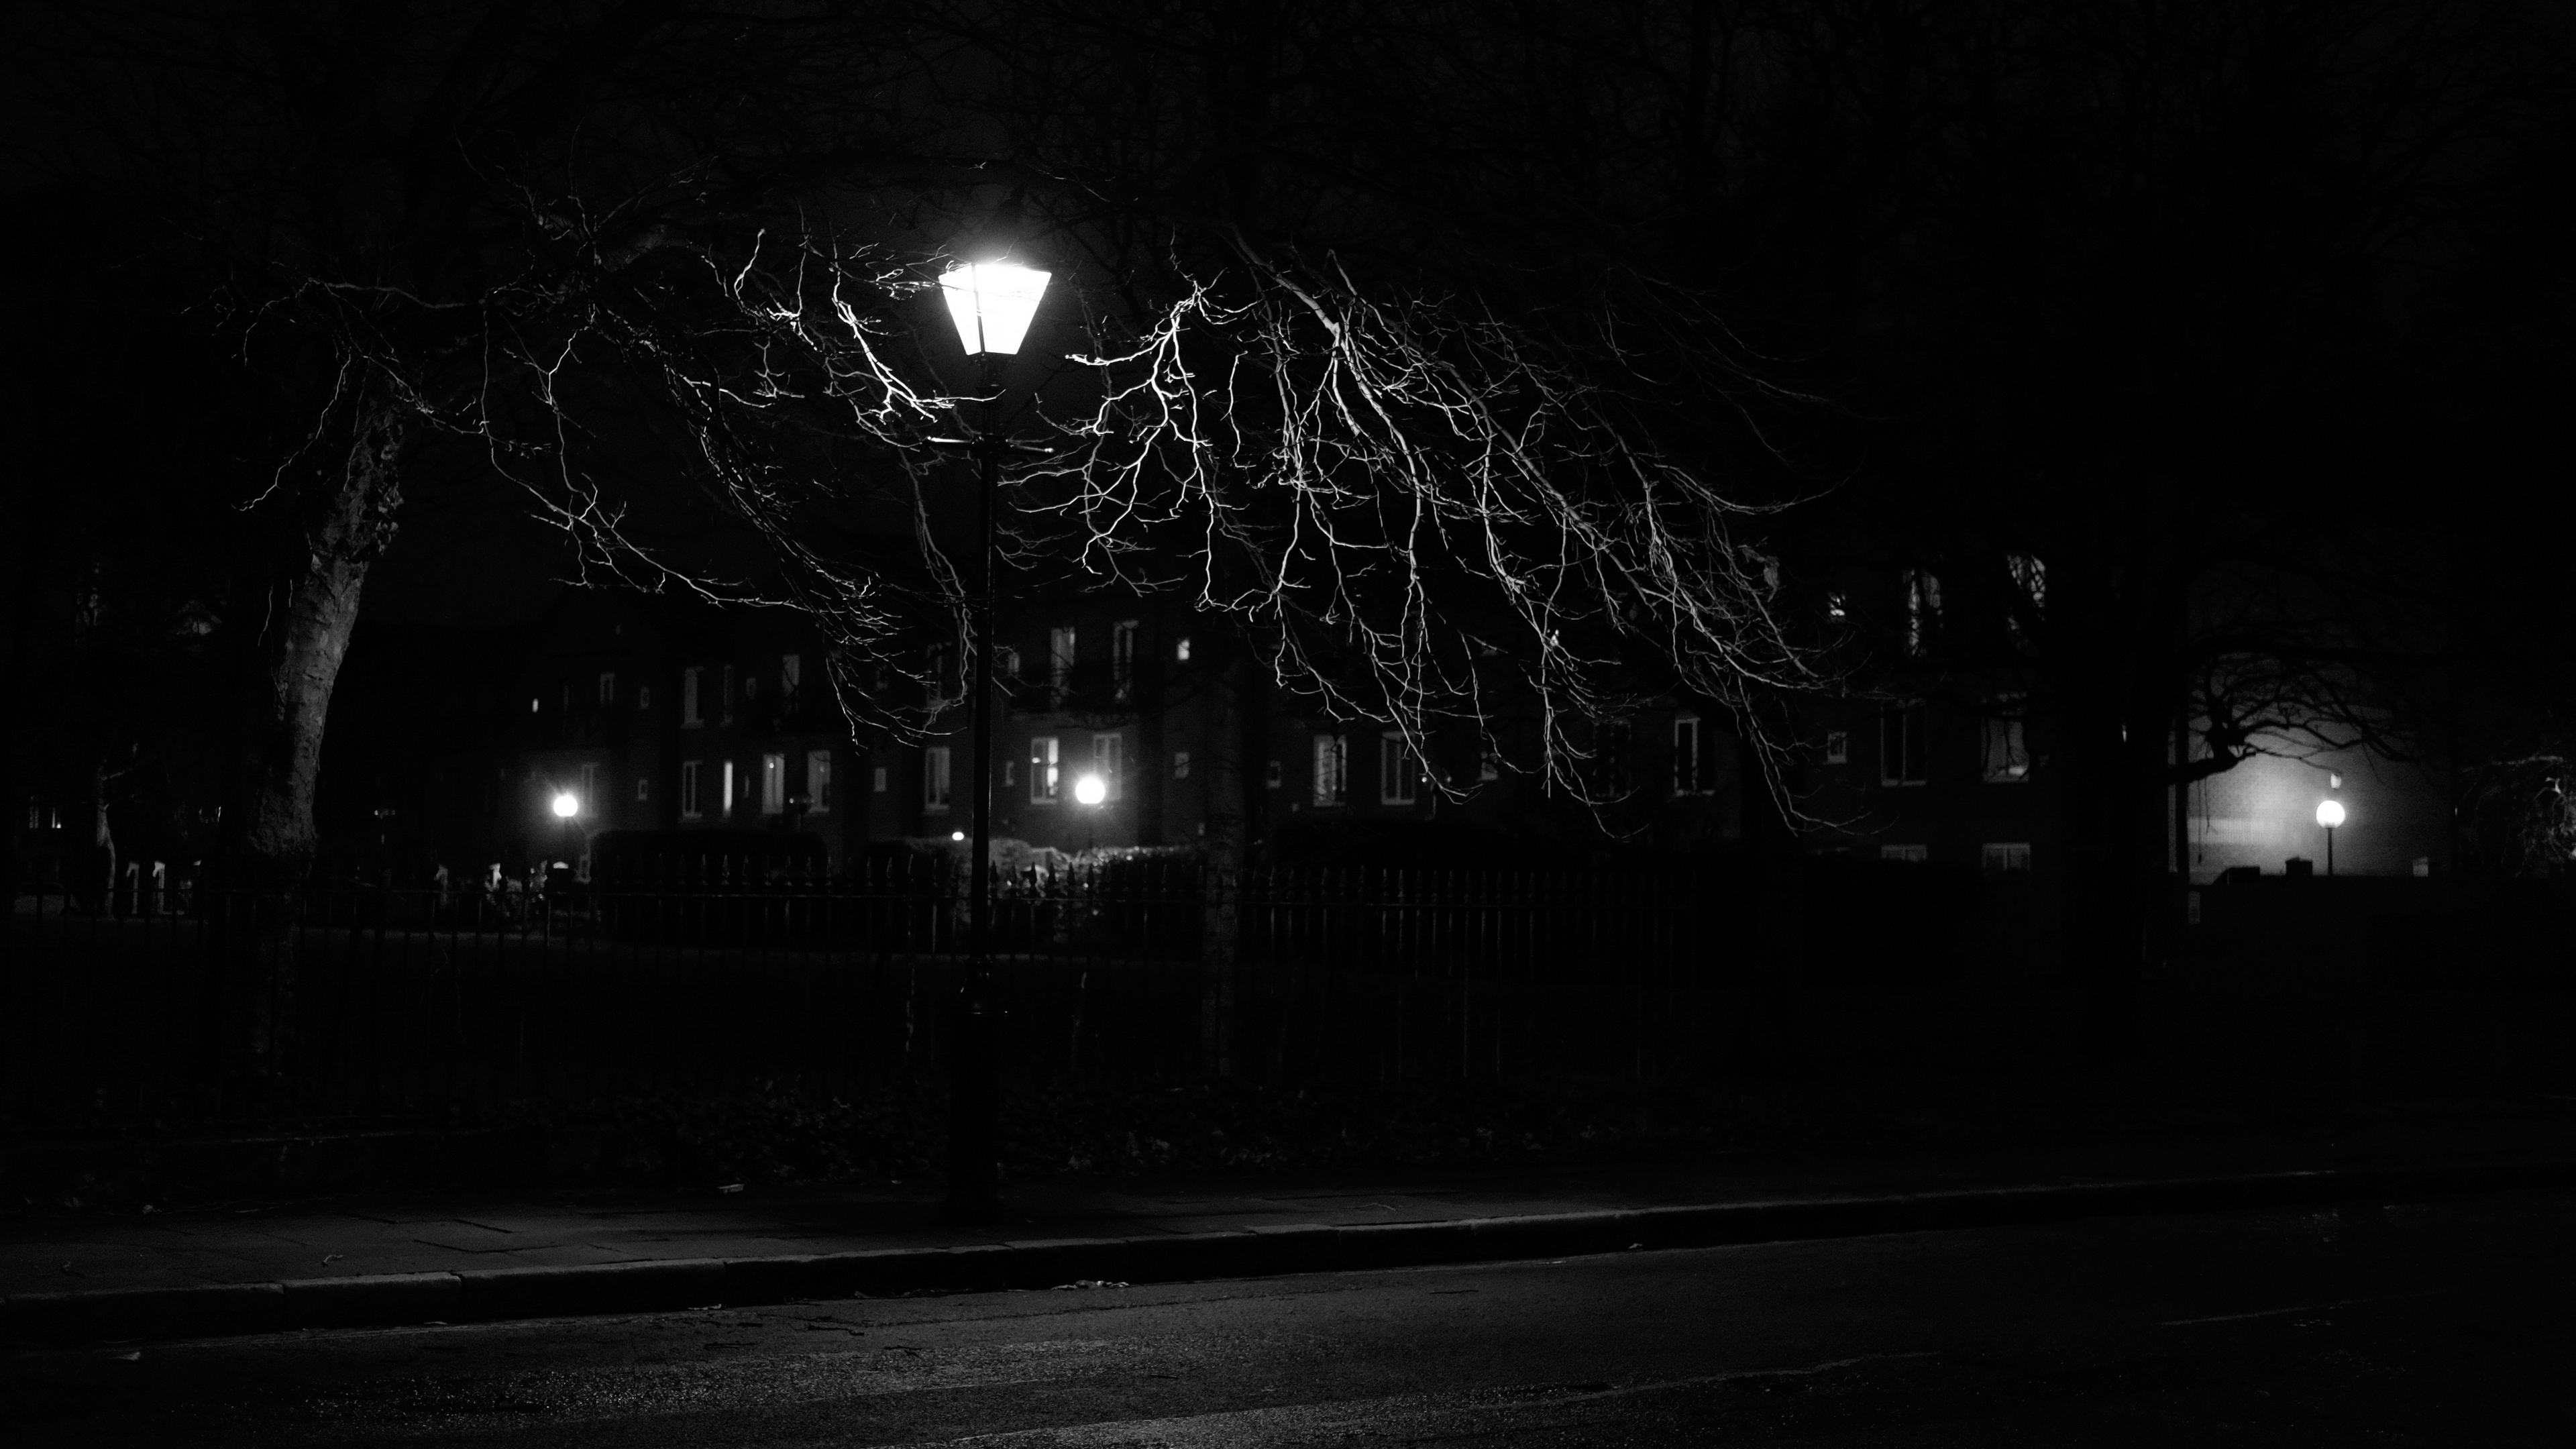 lantern night tree bw 4k 1540576066 - lantern, night, tree, bw 4k - tree, Night, lantern